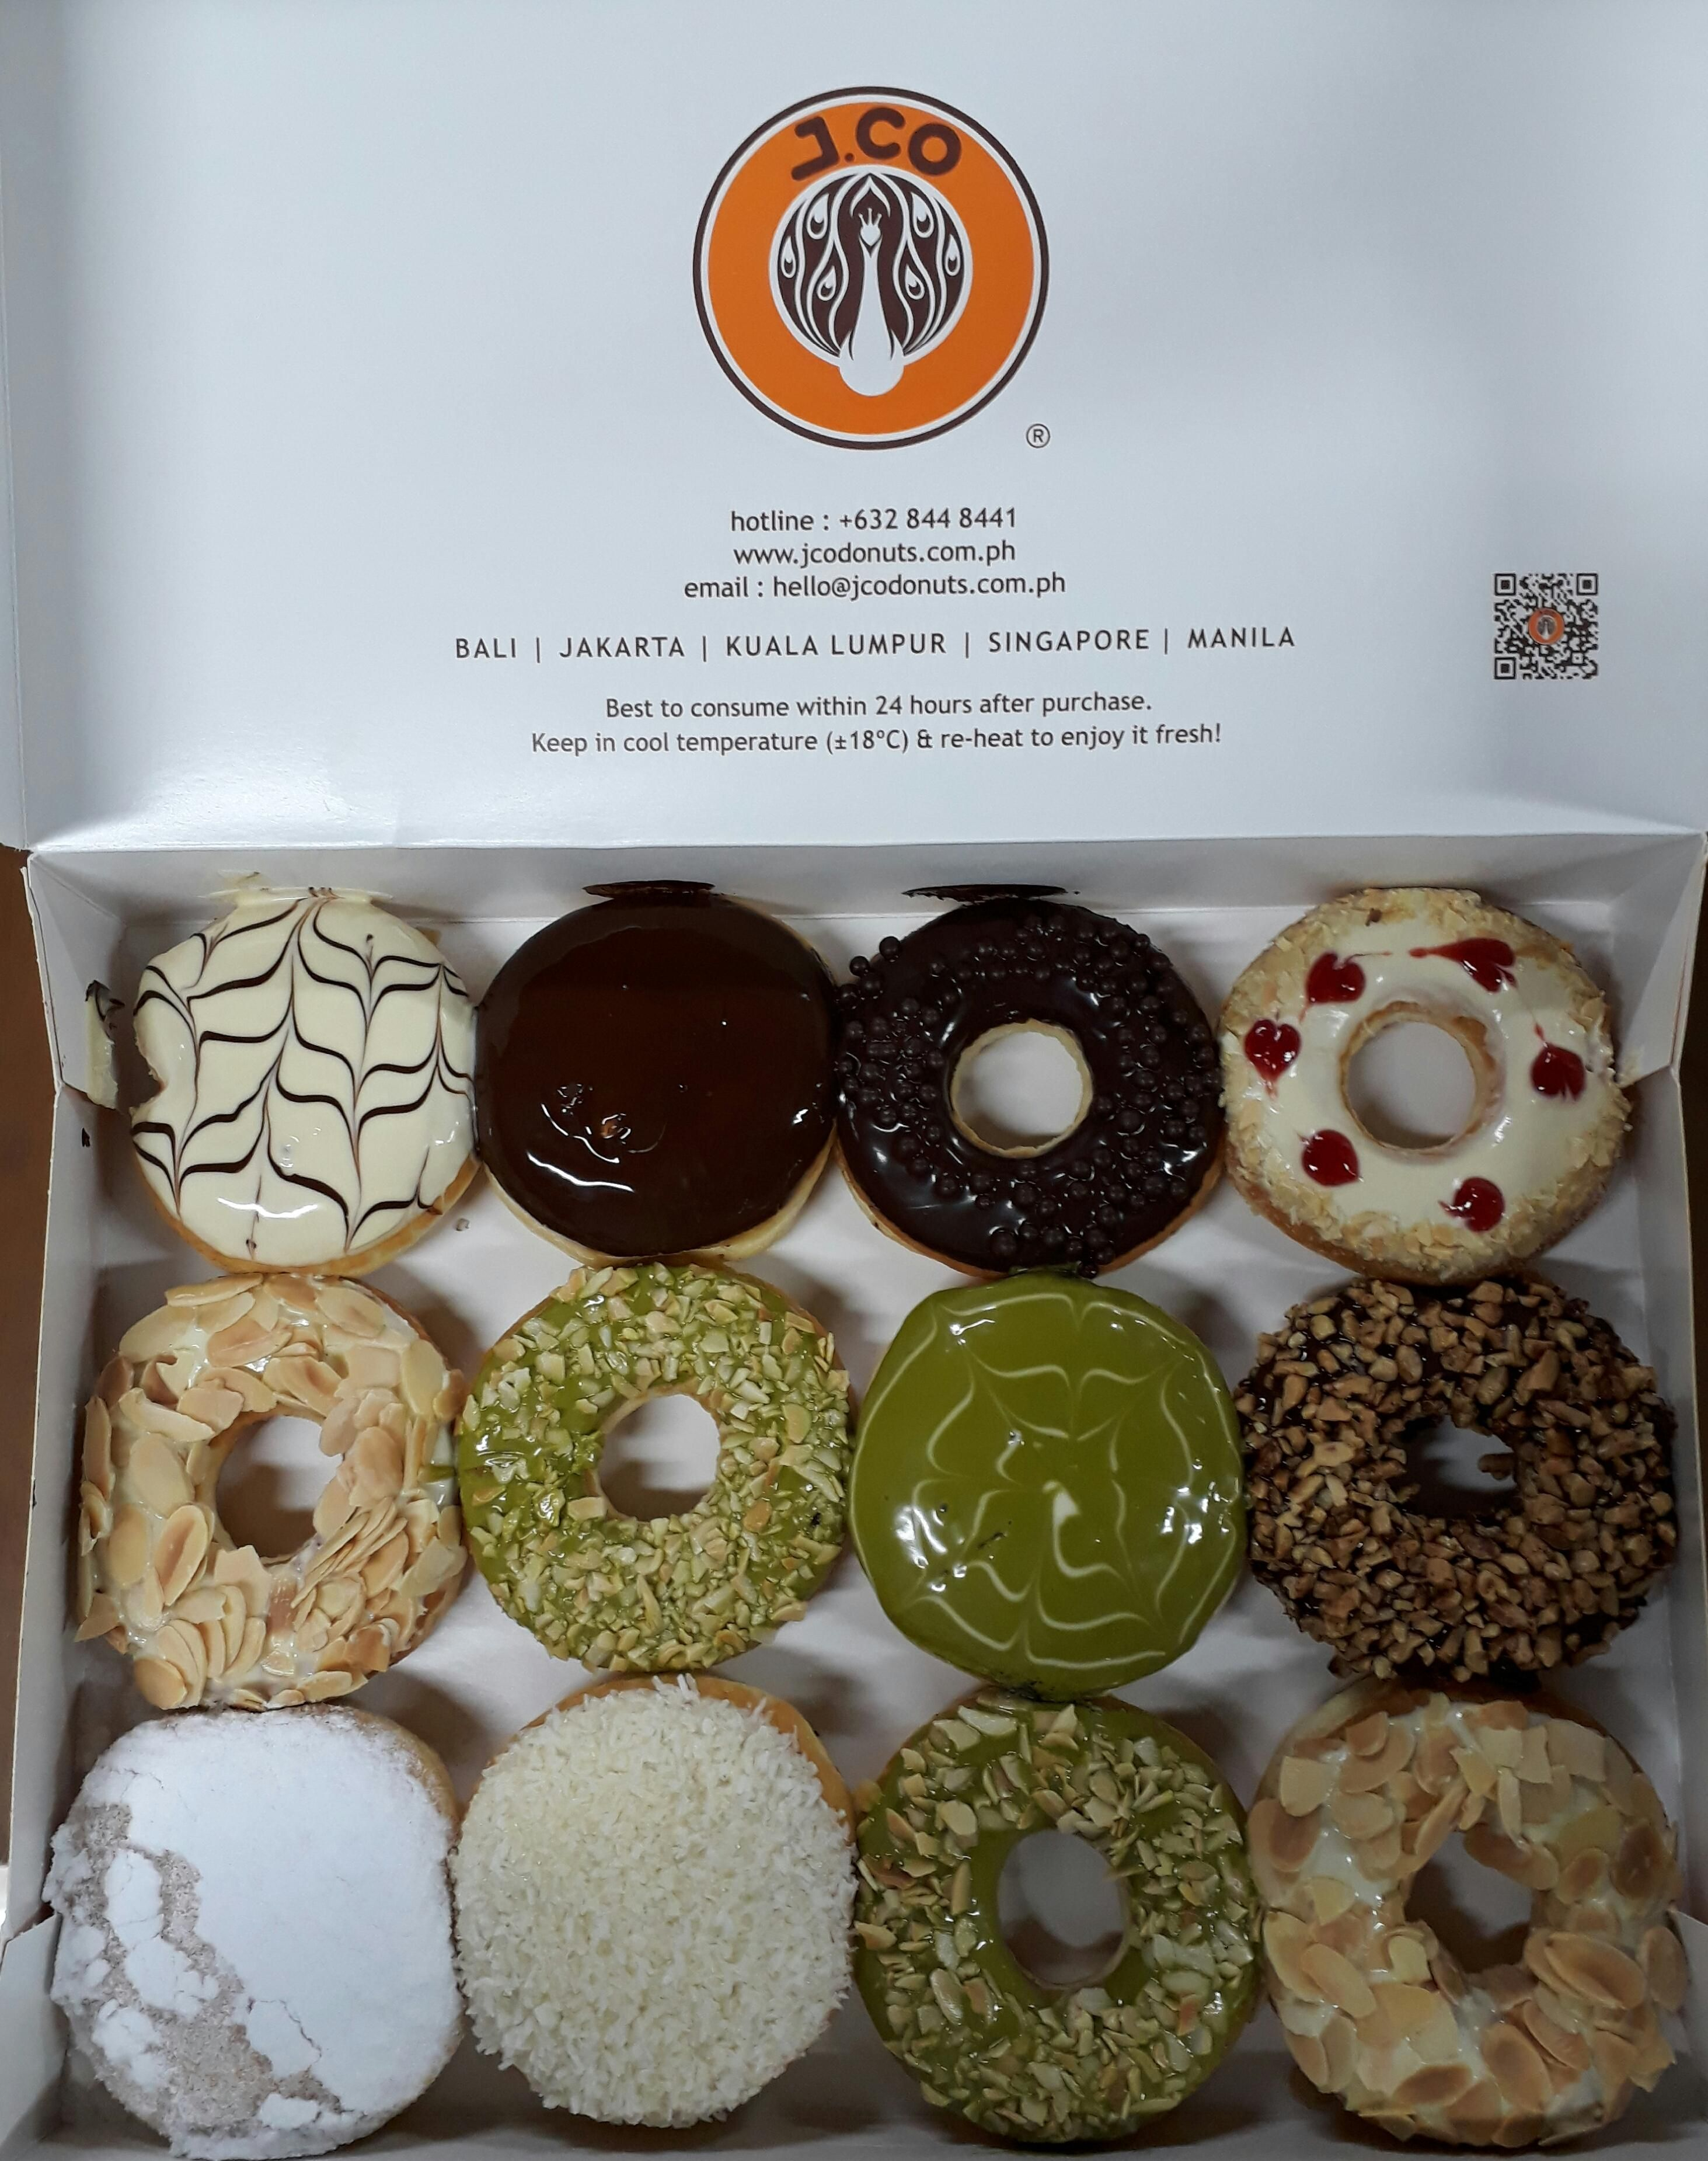 Jenis Donat Jco : jenis, donat, These, Assorted, Donuts, Visit, Moreplz.com, Recipes!, #foodporn, #food, #foodie, #tasty, #deli…, Makanan,, Makanan, Minuman